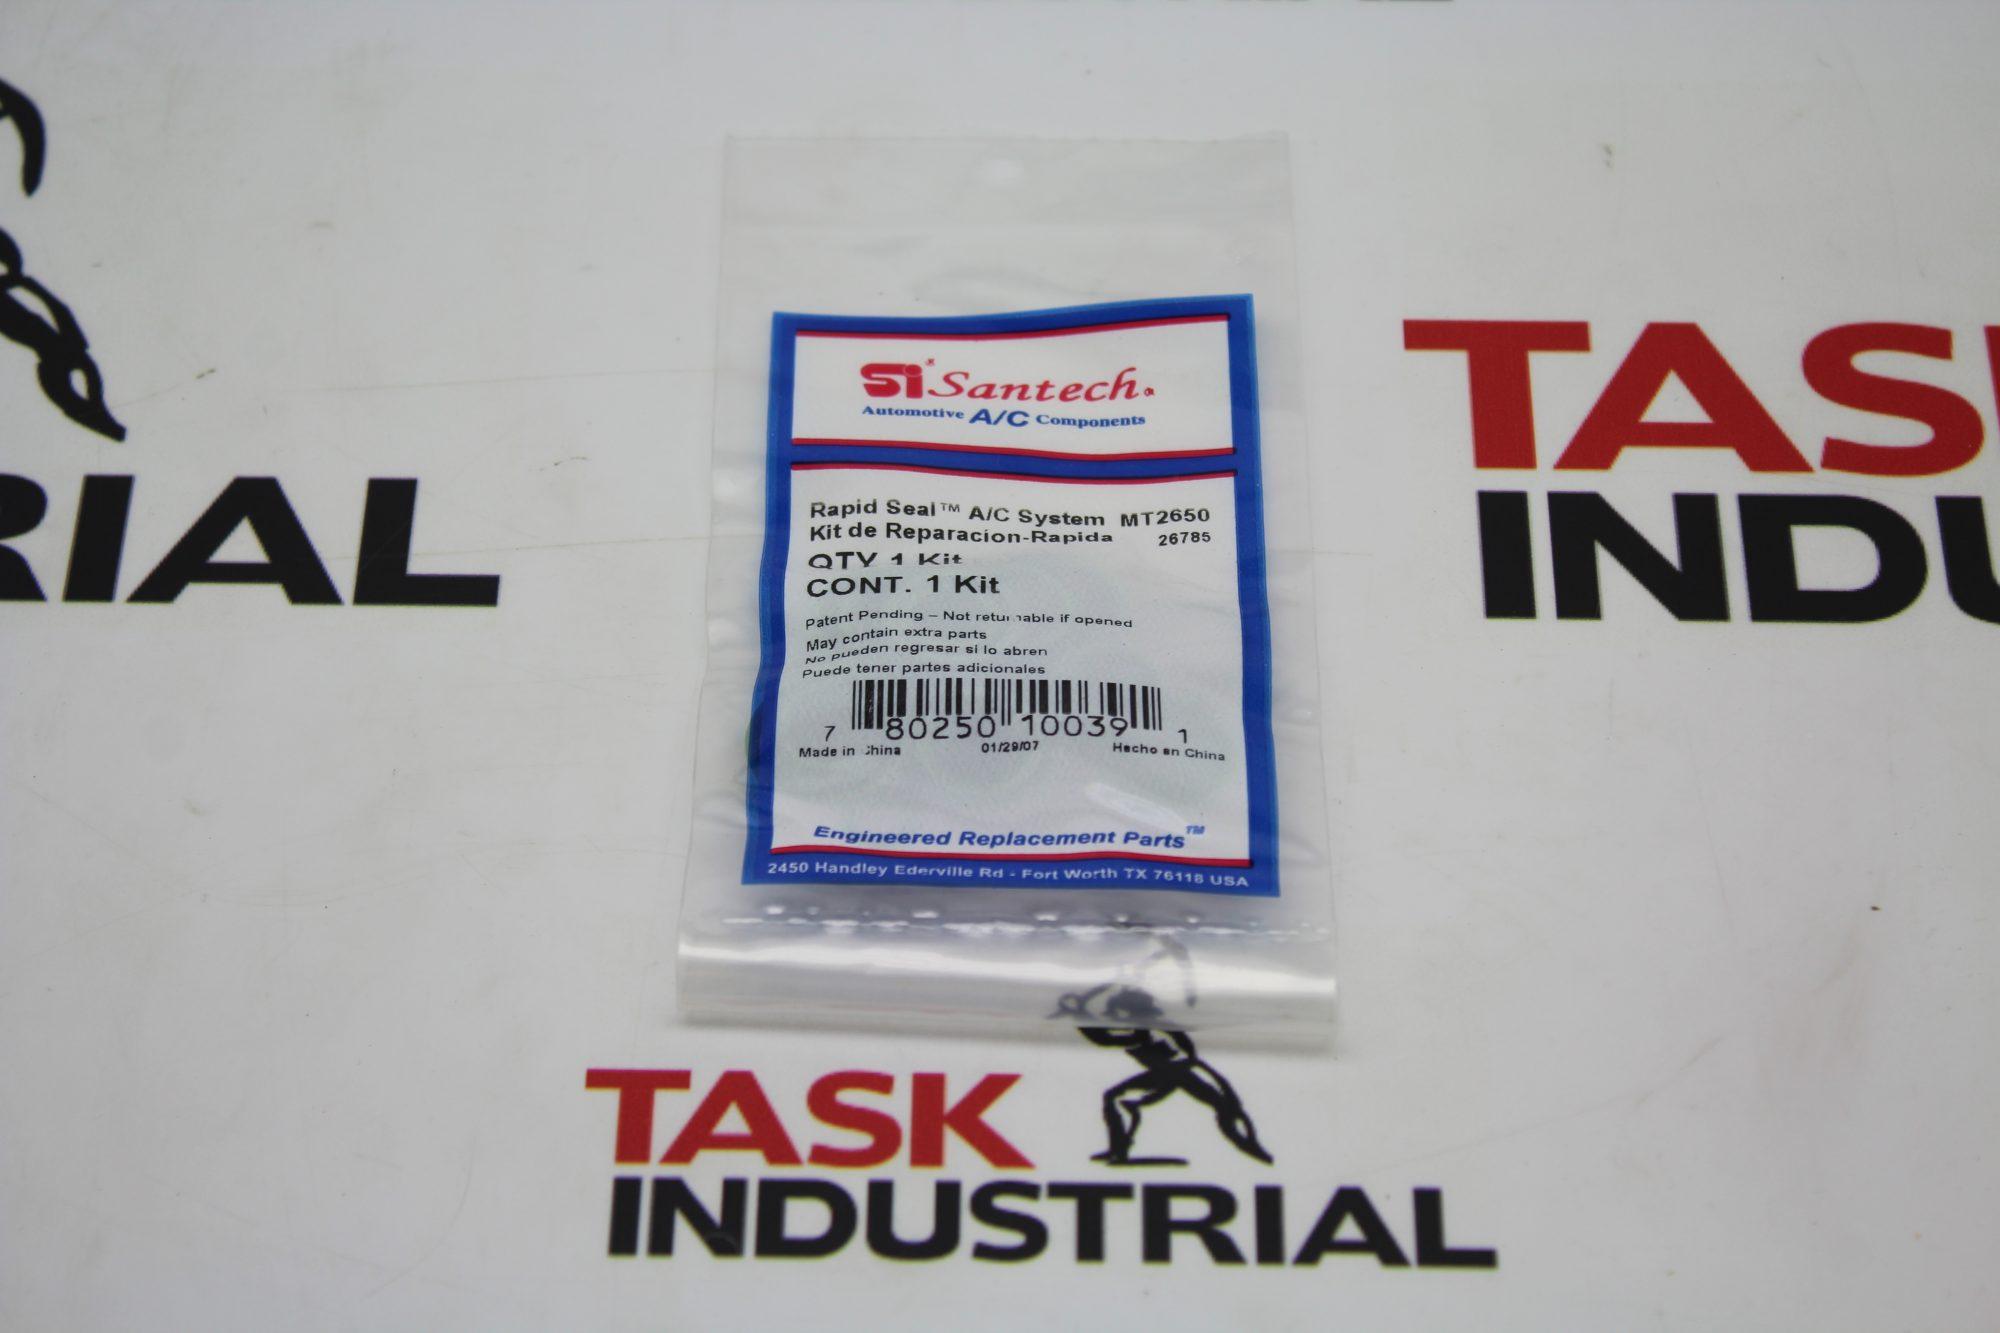 Santech Rapid Seal Kit MT2650